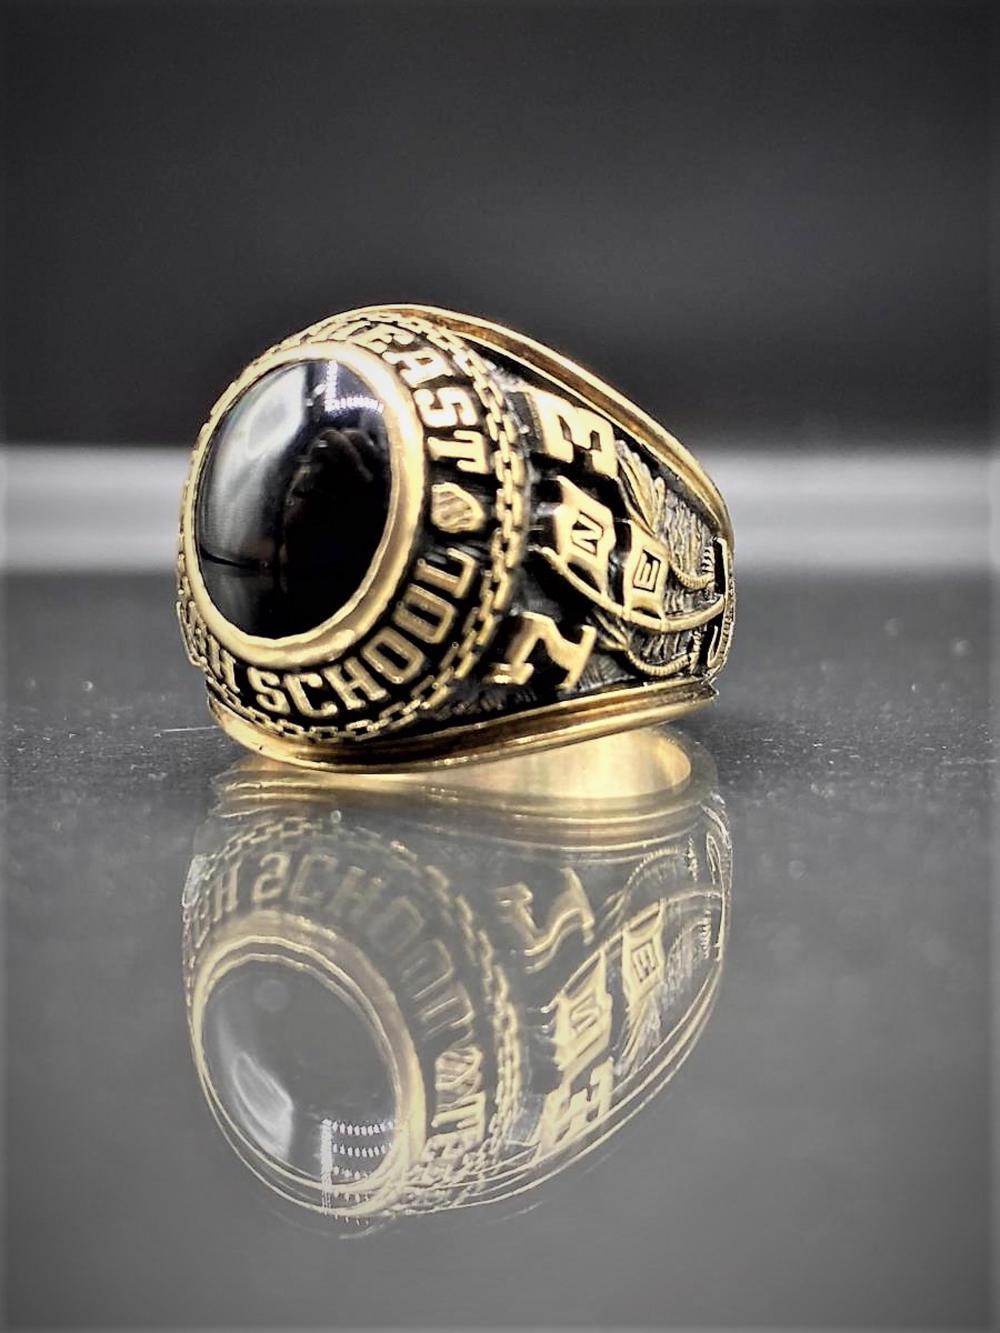 10K Gold/Obsidian 1973 Class Ring